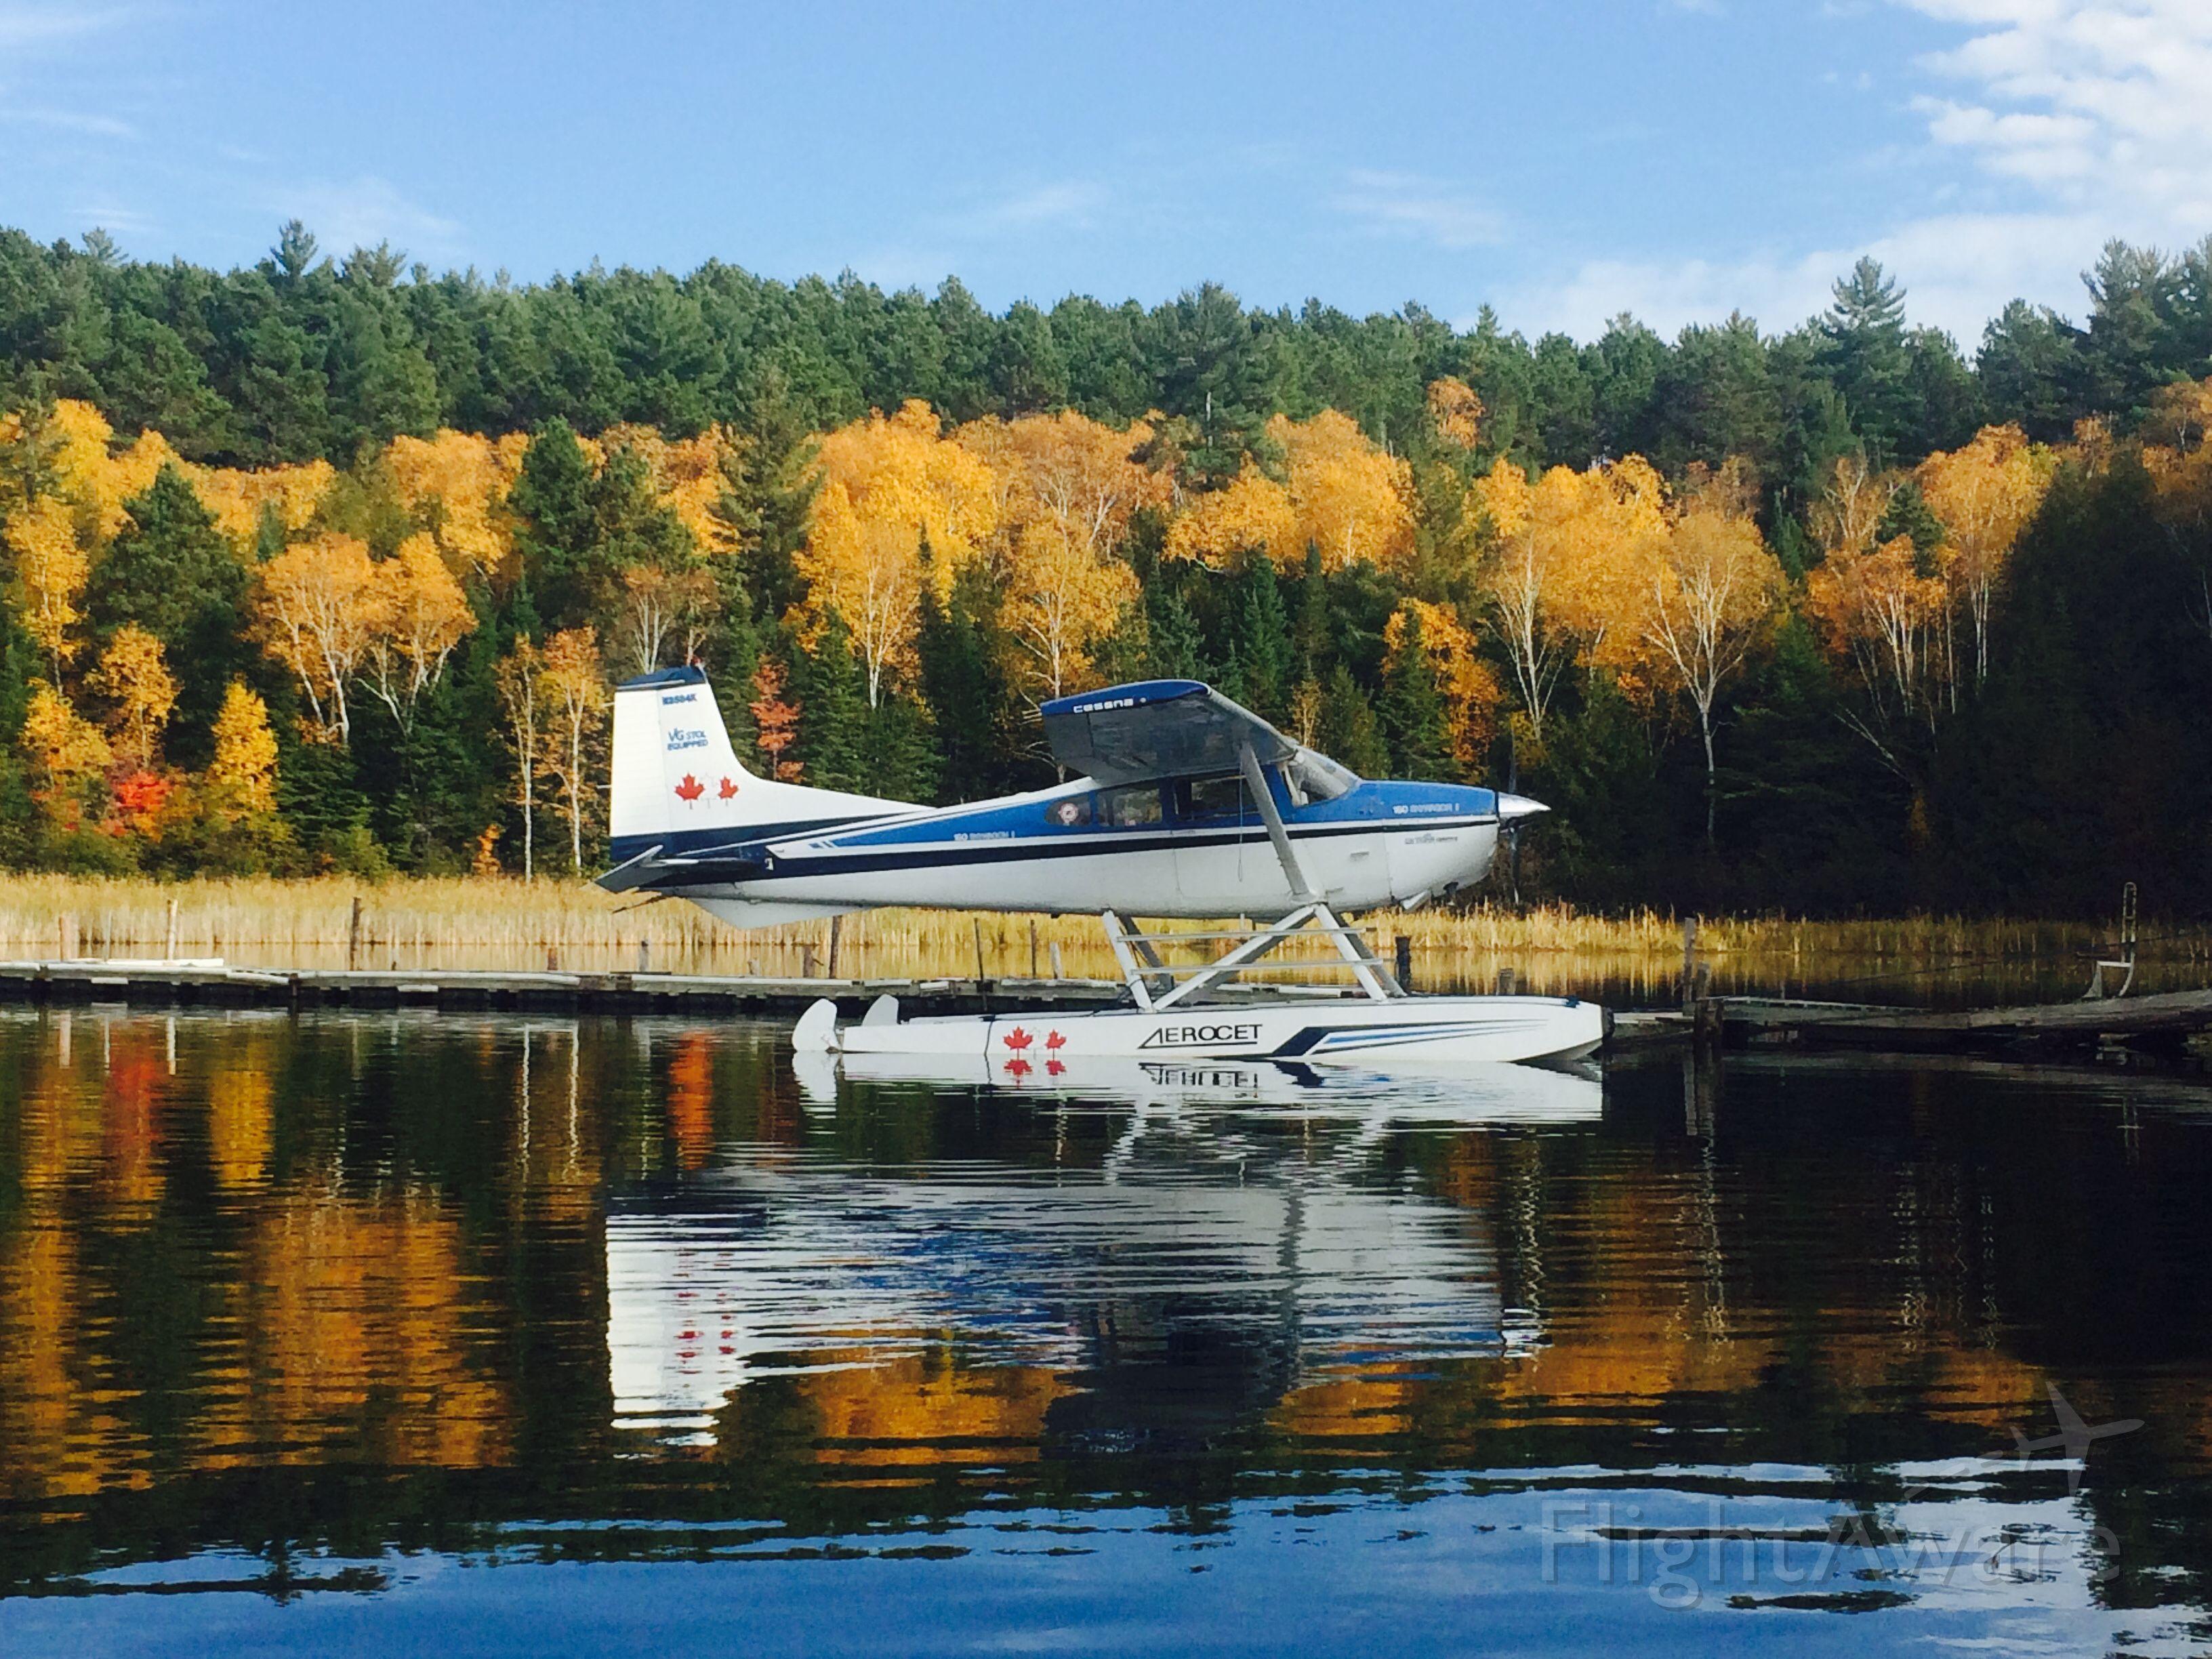 Cessna 152 (N2584K) - At th3 dock in Ontario.